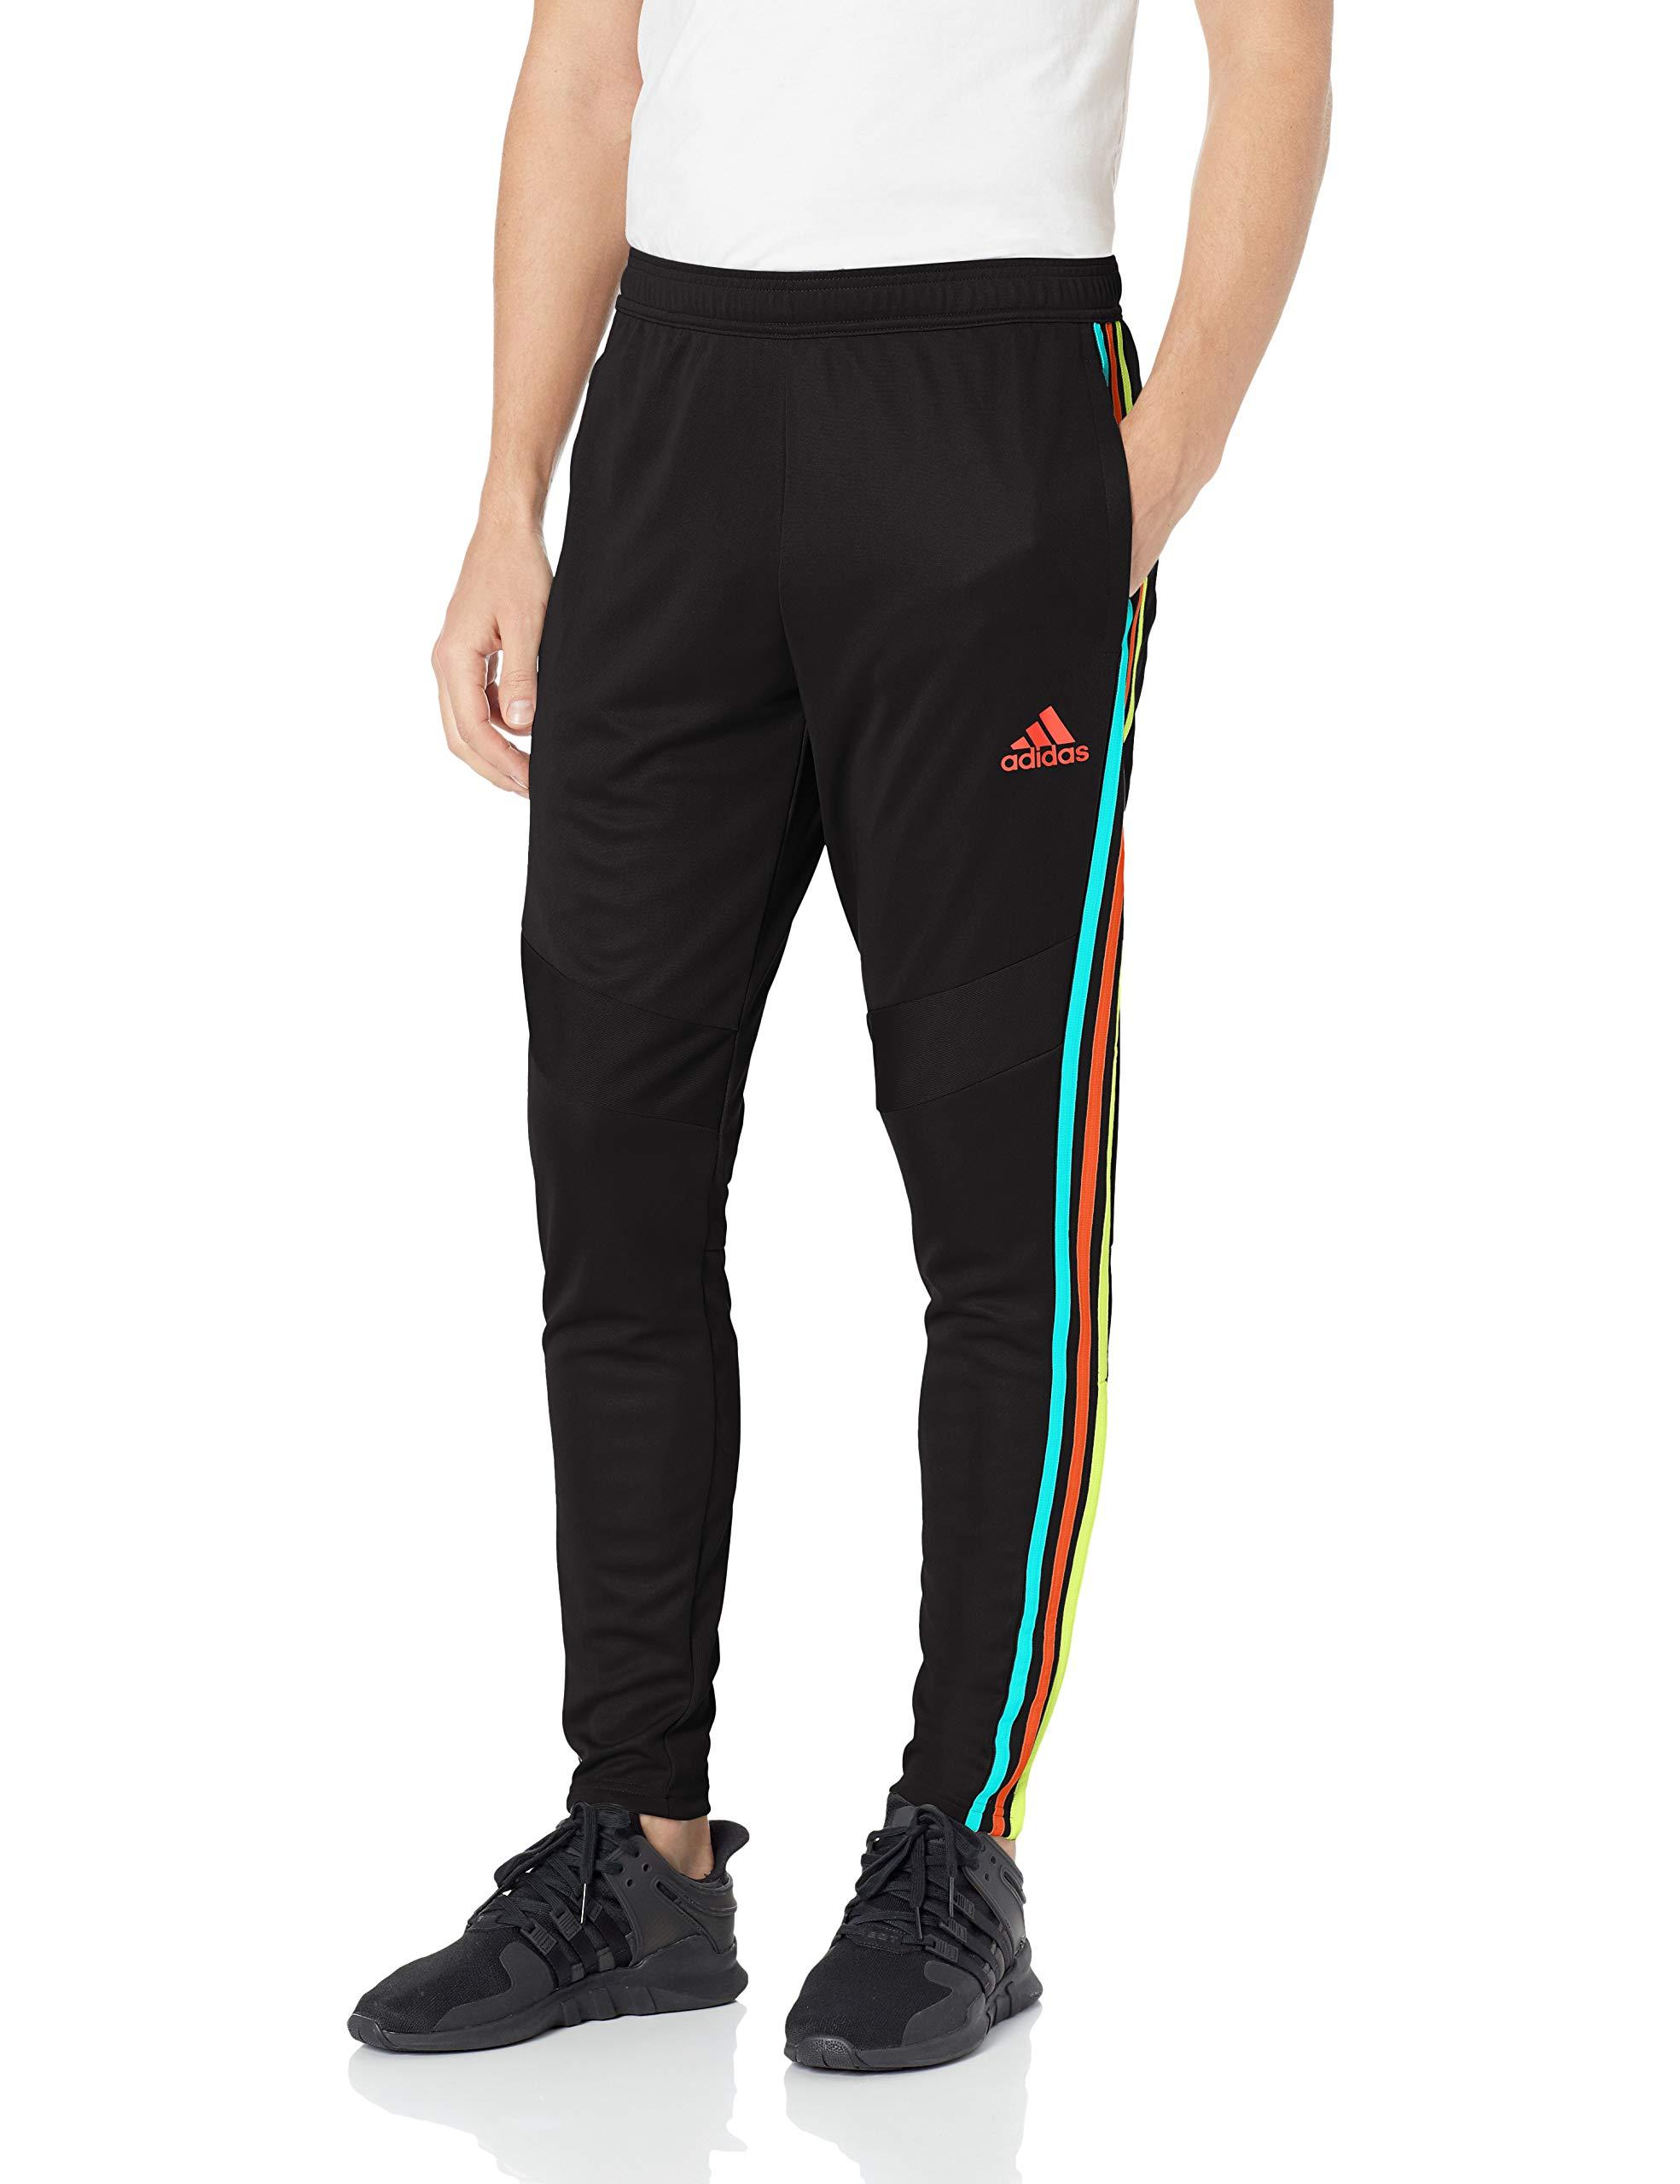 adidas Men's Tiro19 PNT, Black, X-Large